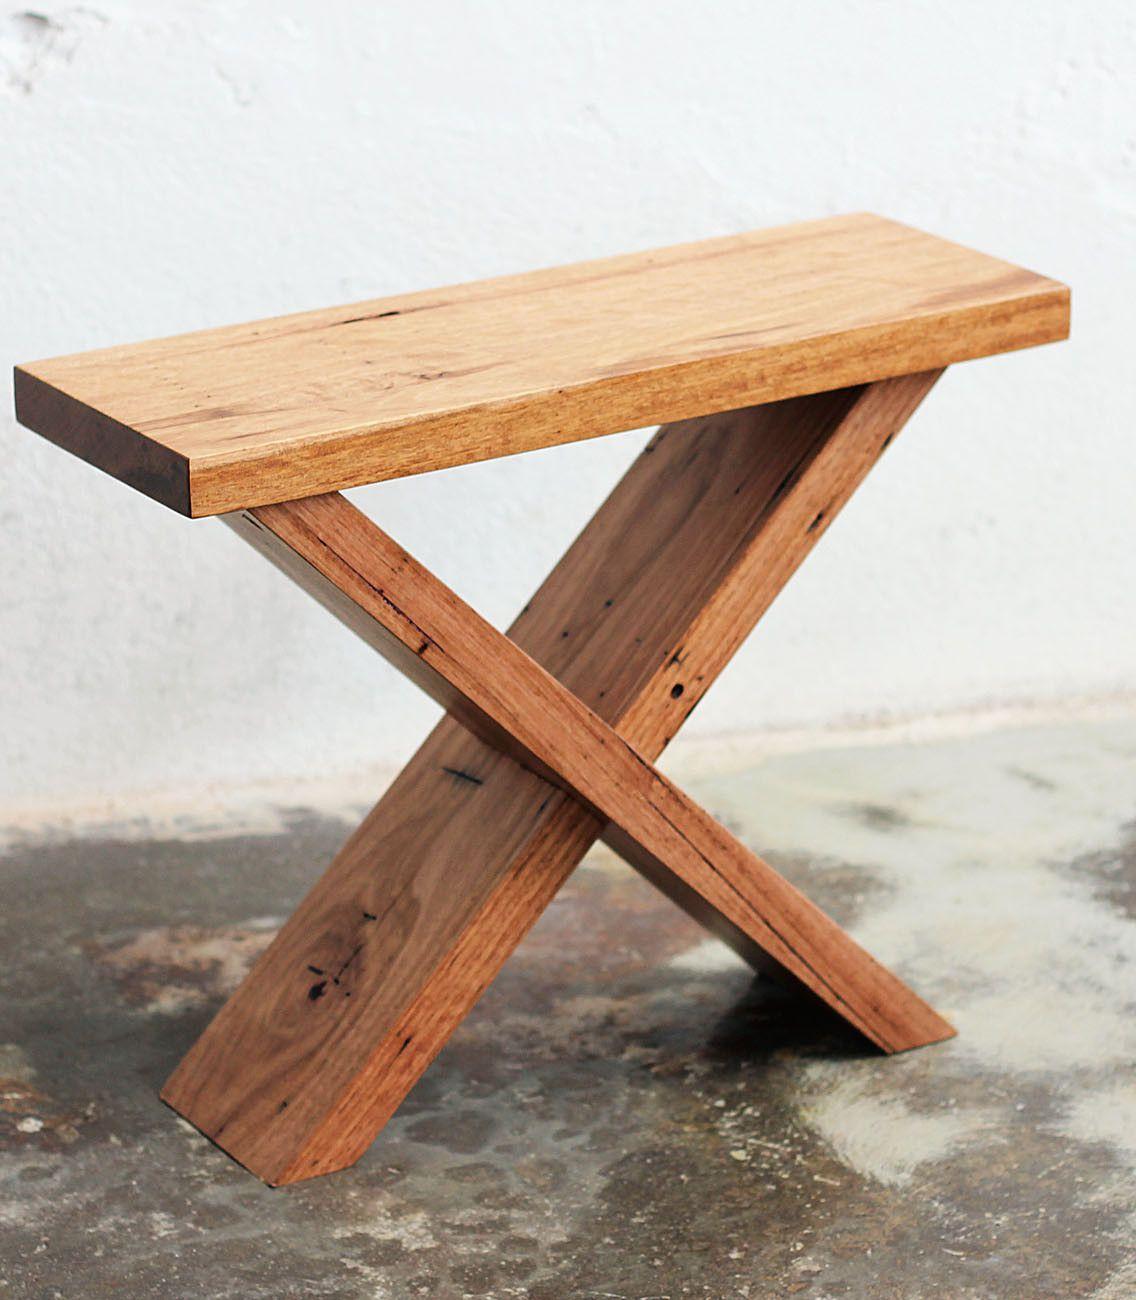 Kit Kat - Recycled Timber Furniture Melbourne, Yard ...